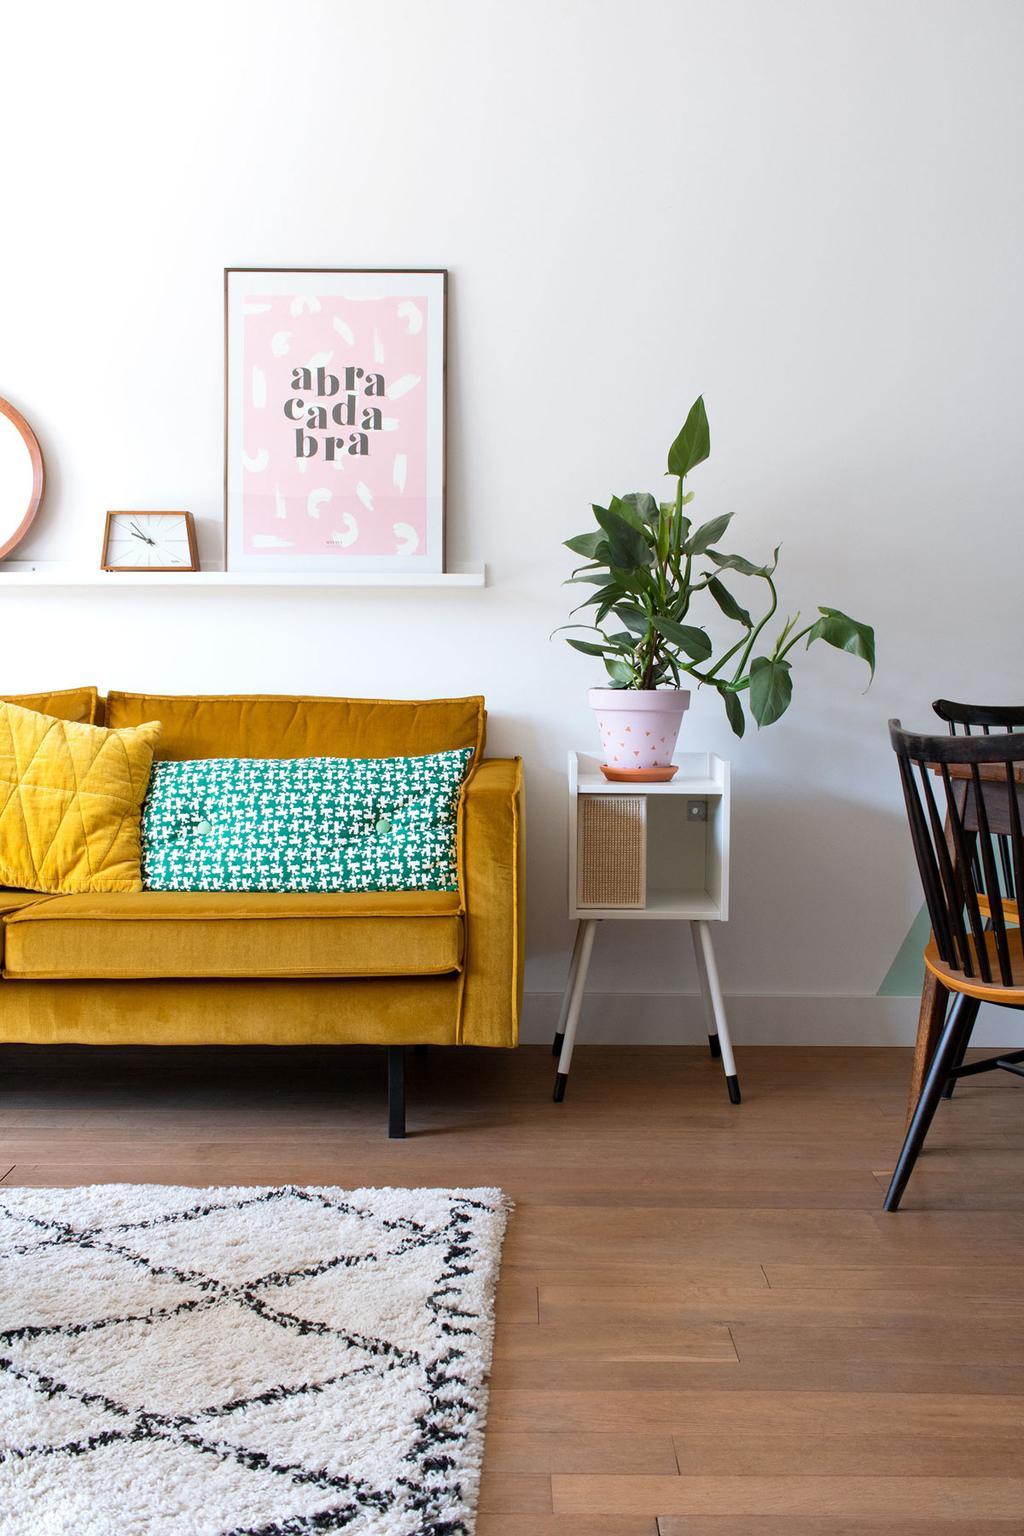 Kattenhuis en plantenstandaard in de woonkamer